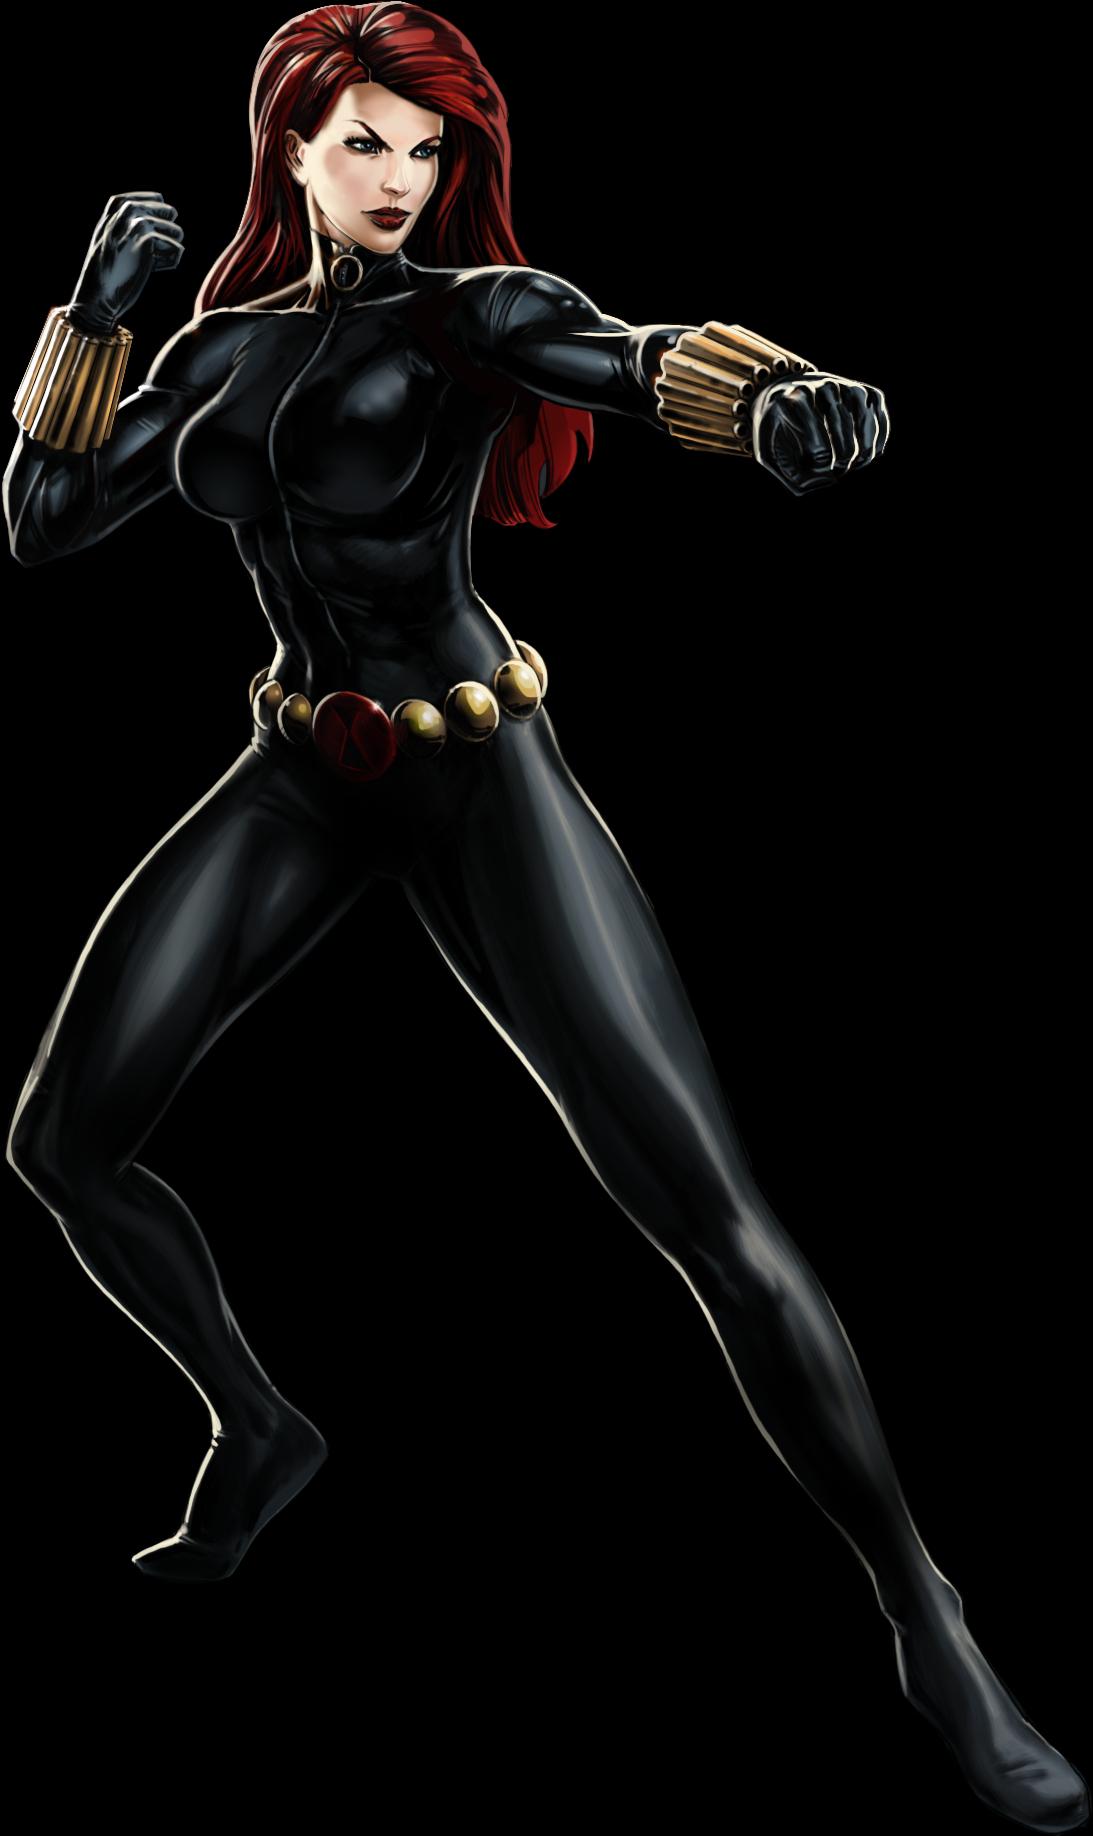 Black Widow Black Widow Marvel Black Widow Avengers